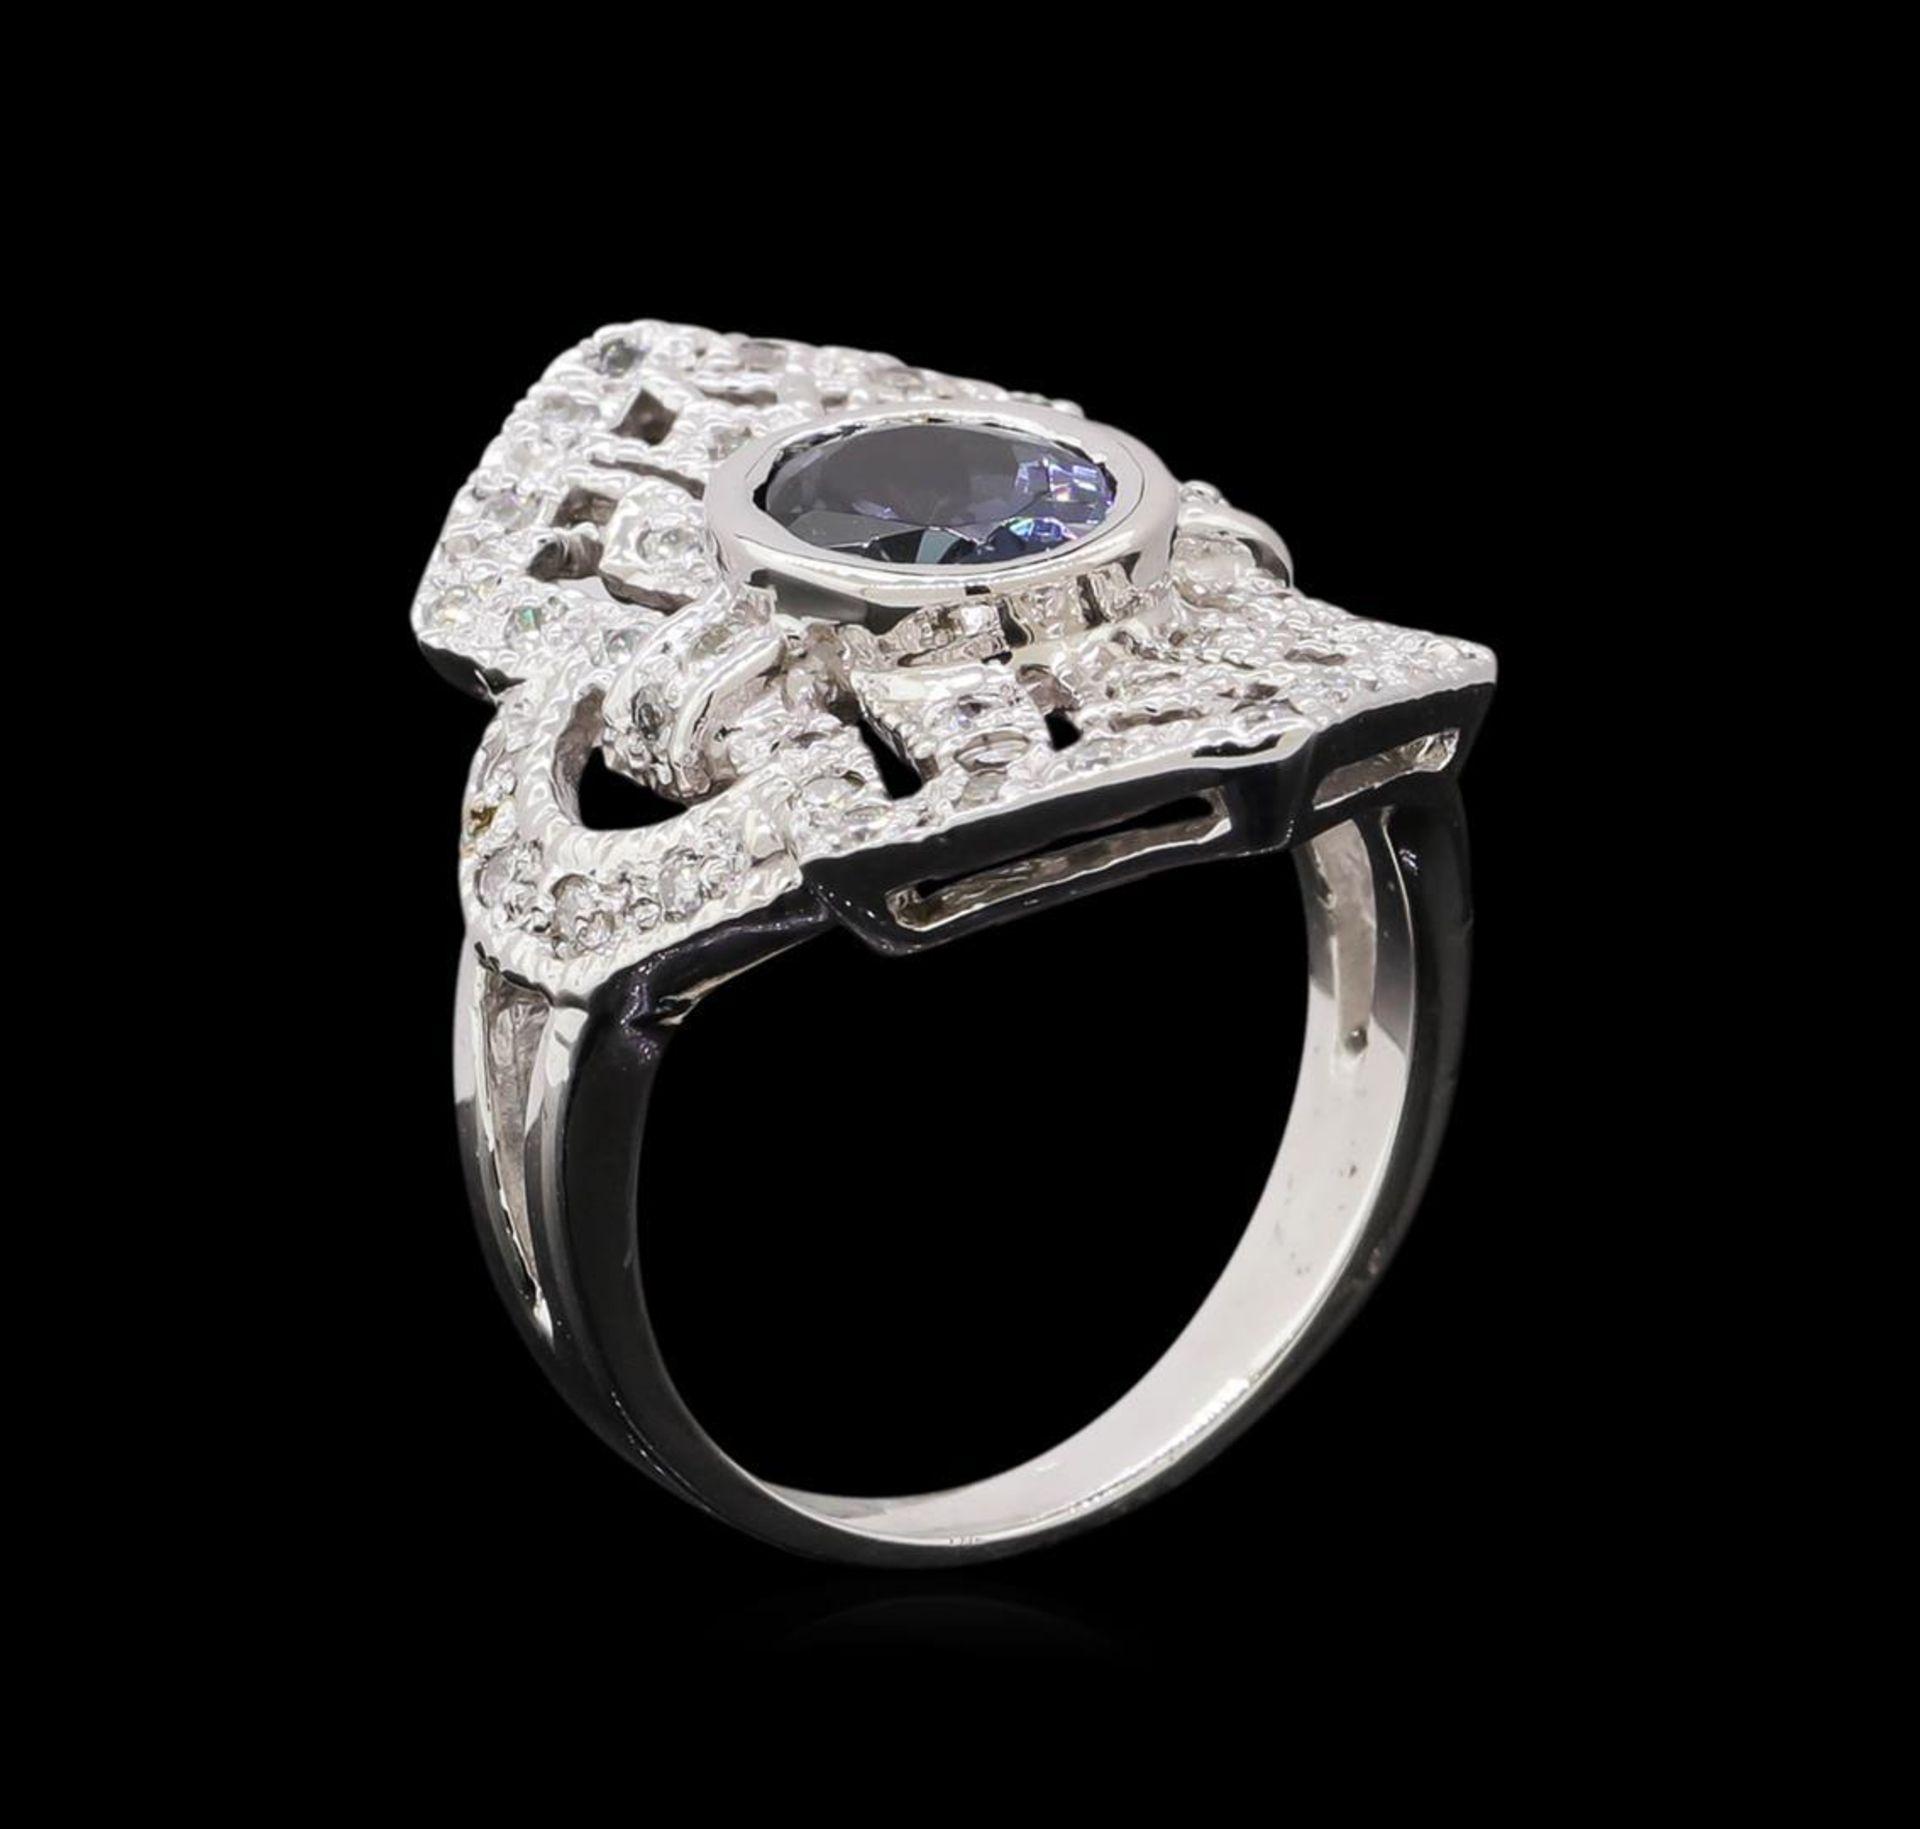 1.84 ctw Tanzanite and Diamond Ring - 14KT White Gold - Image 4 of 5